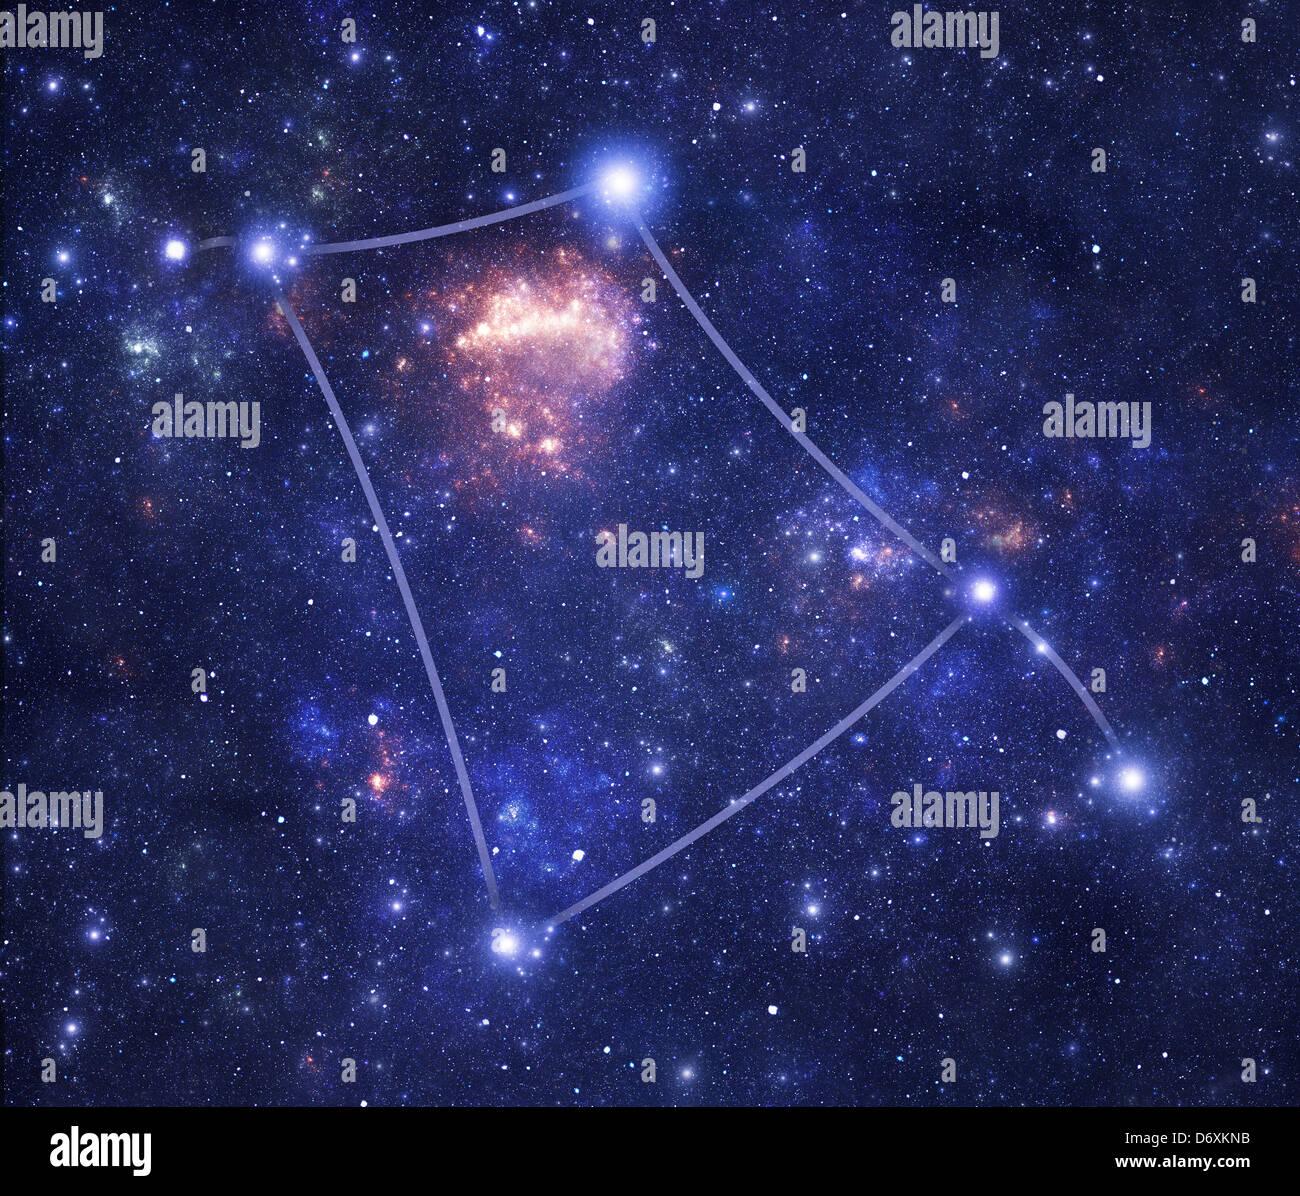 Constellation Corvus (Crv), one of the modern constellations - Stock Image